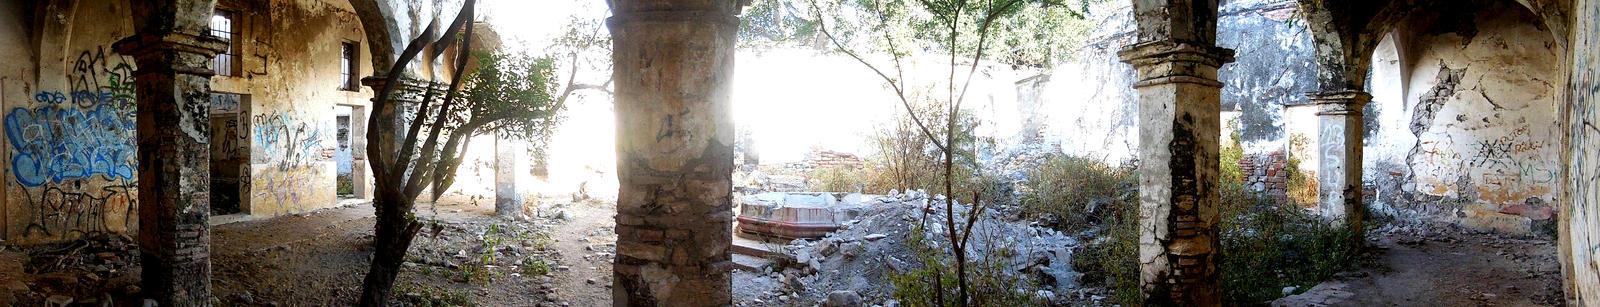 Ex hacienda de San Juan Raboso, I. de M. Puebla